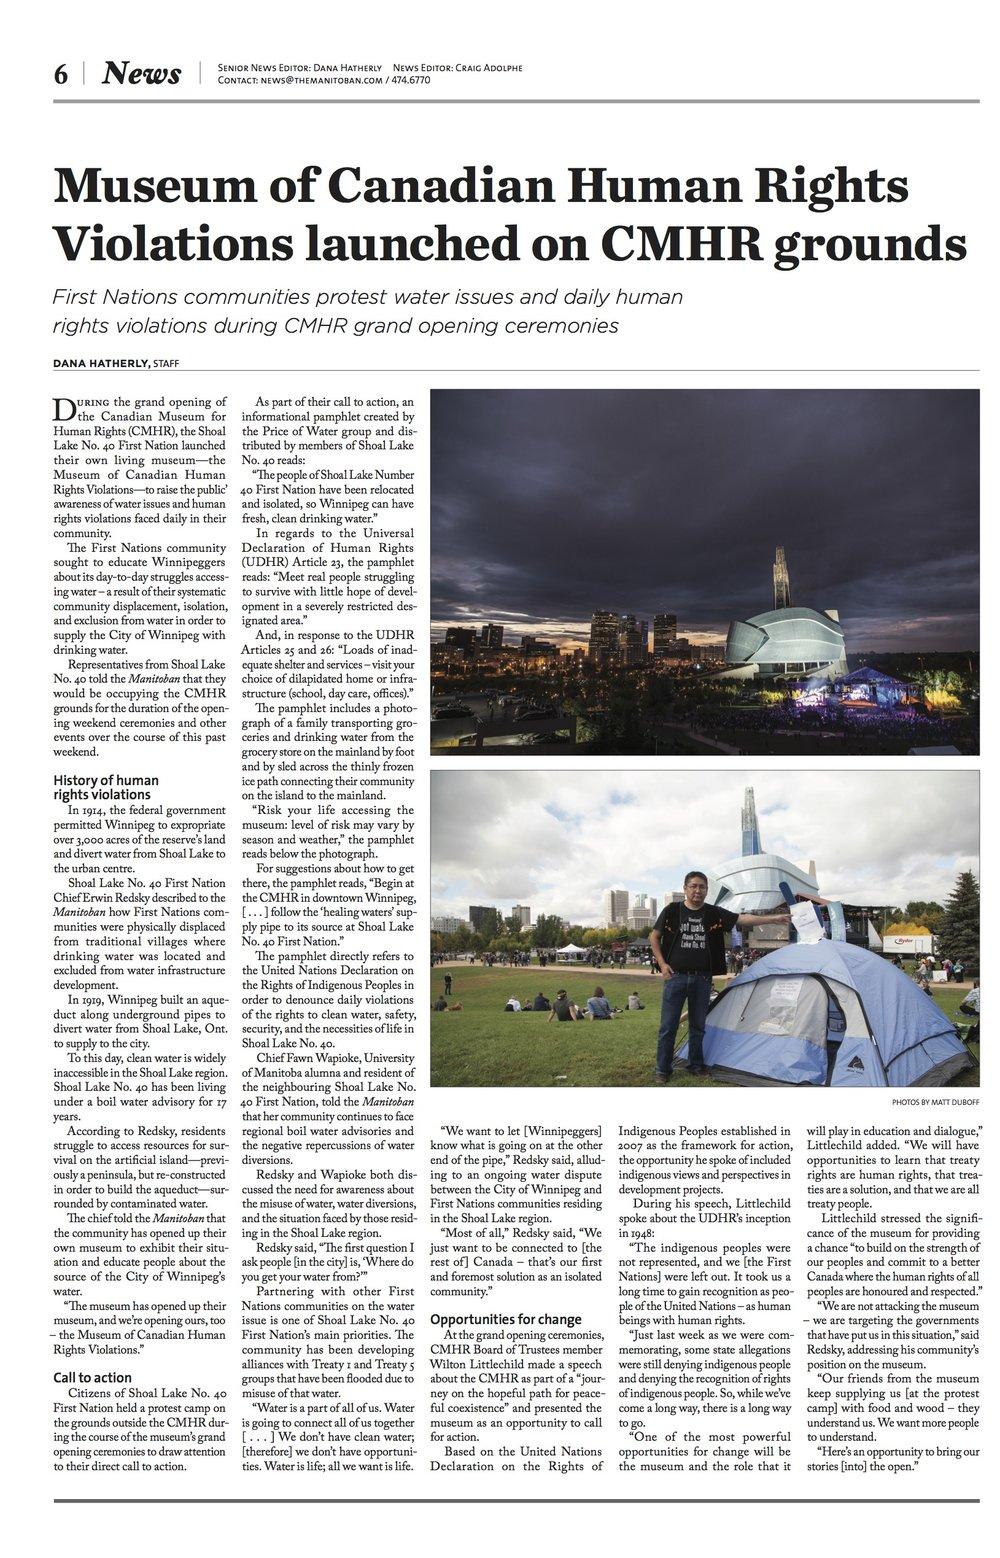 2014.09.23 - The Manitoban - Page 6.jpg